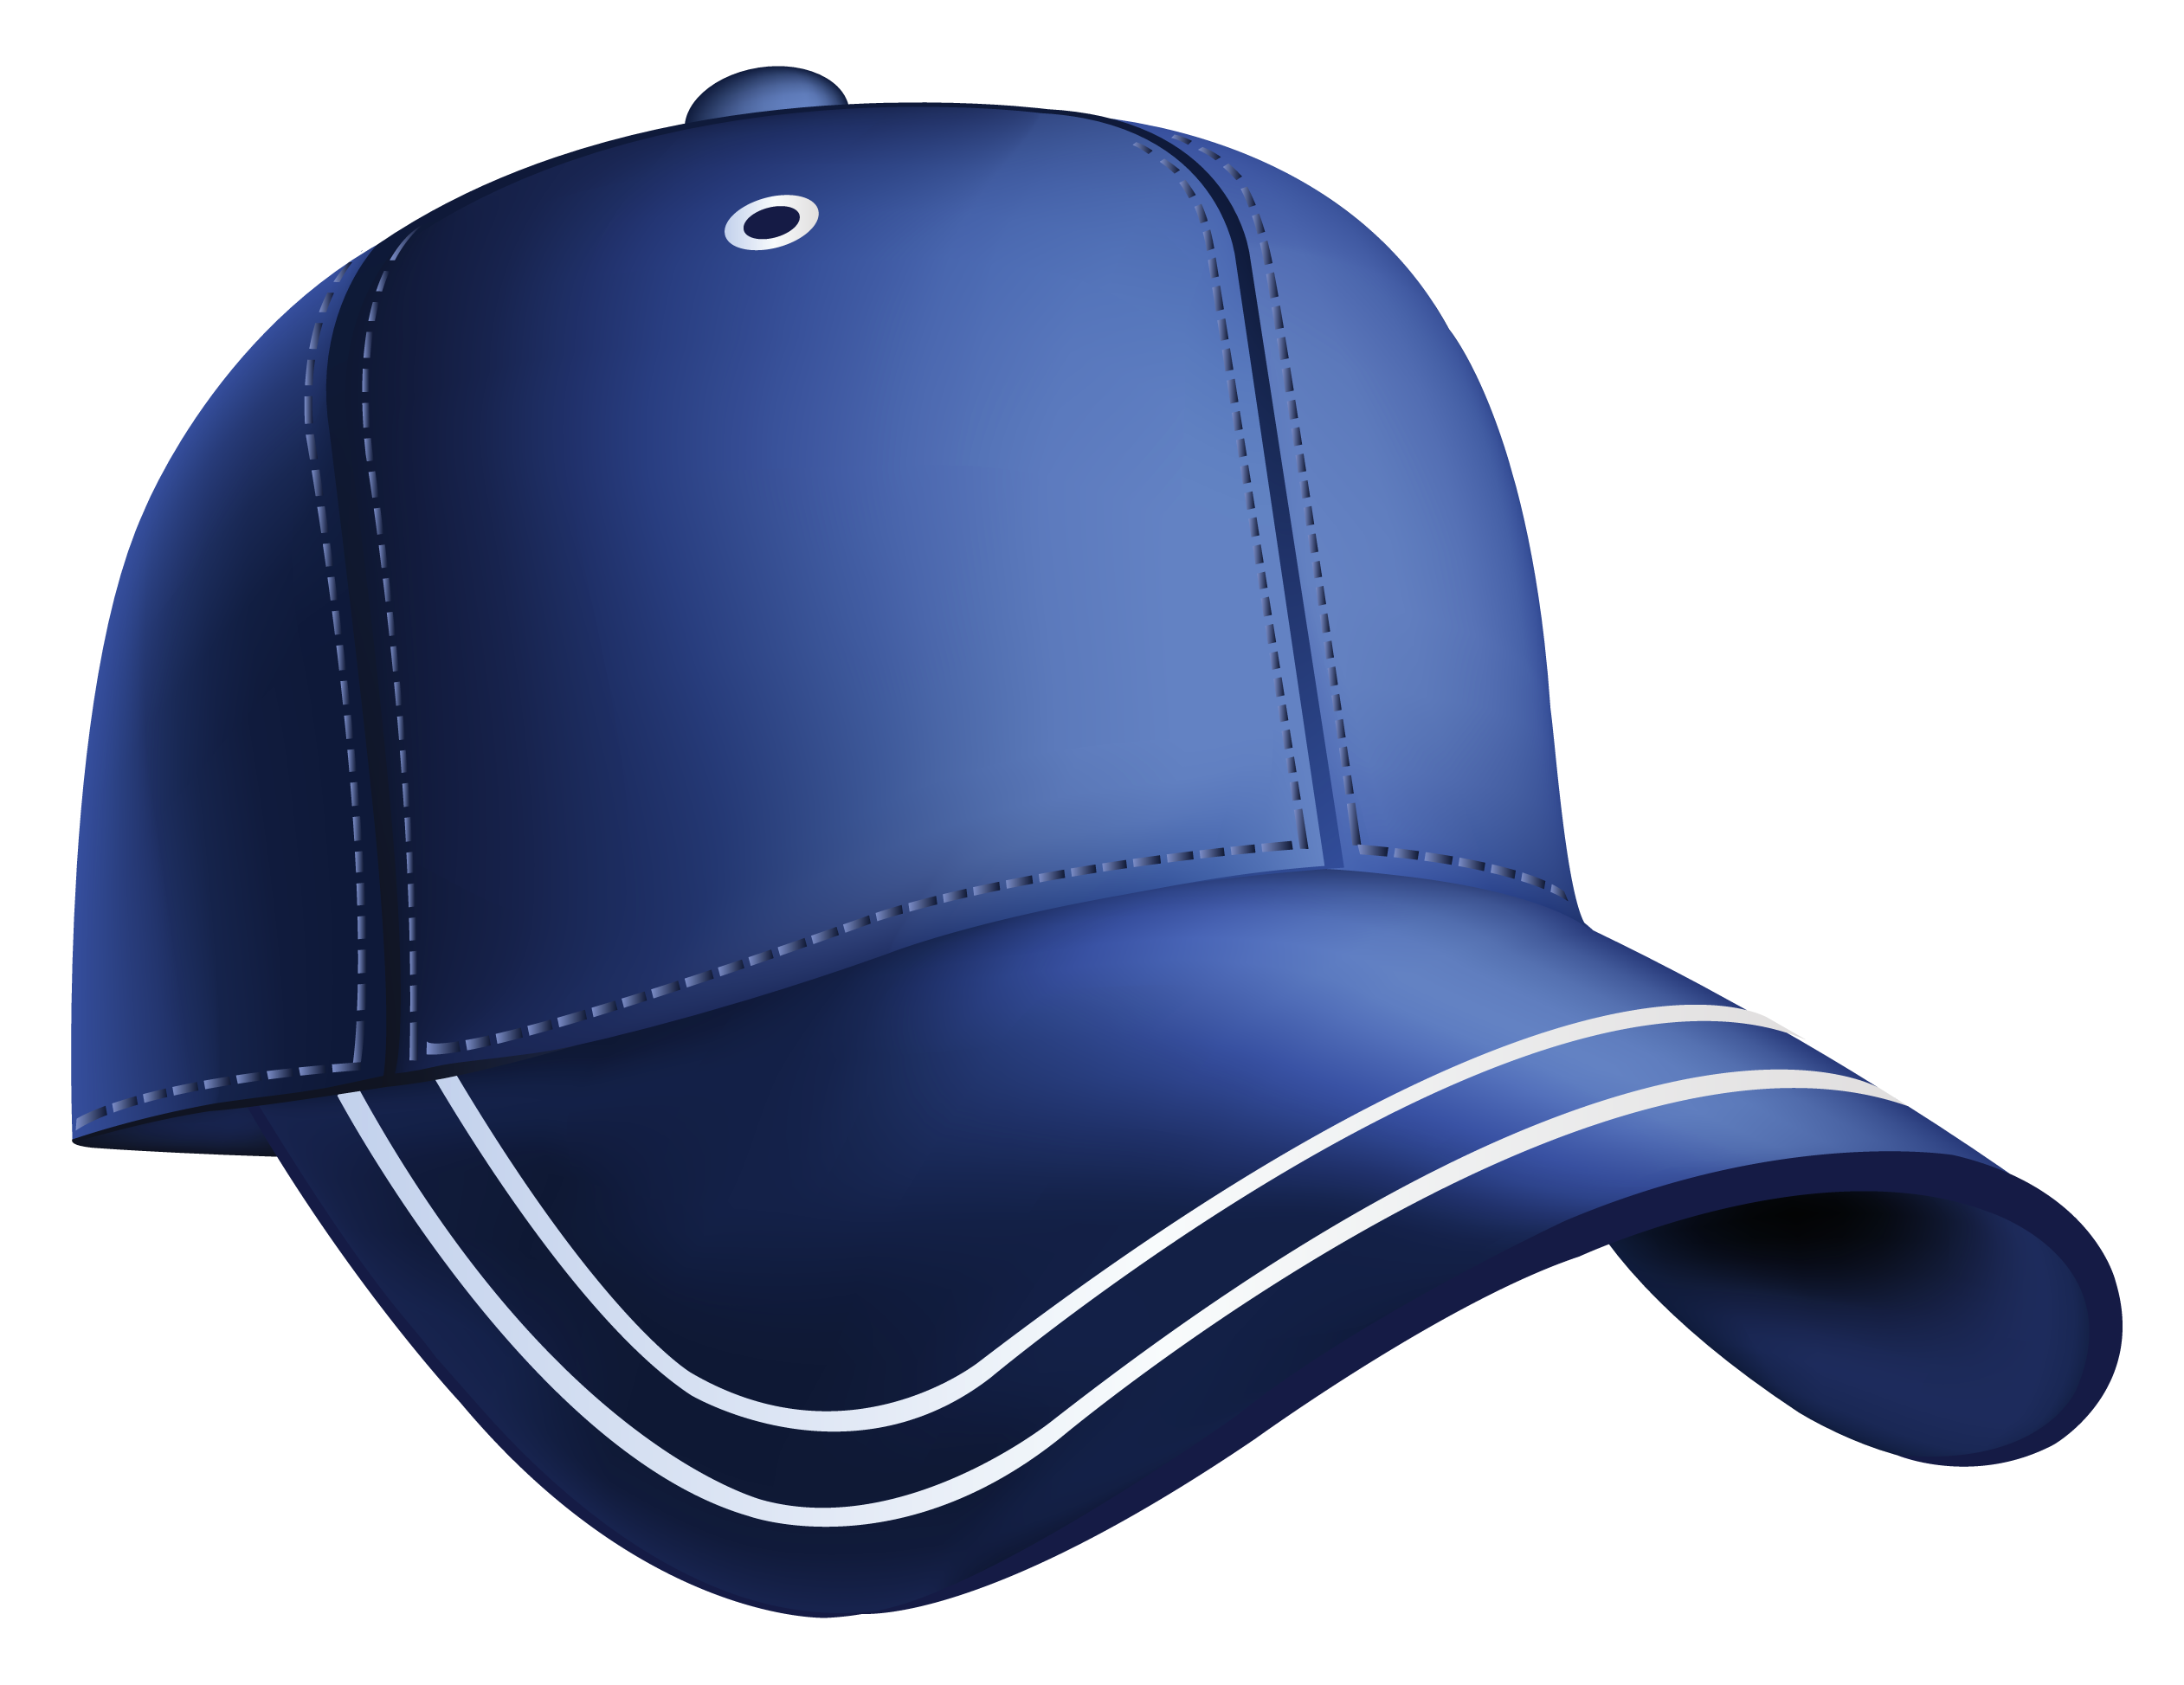 baseball hat clip art cliparts co cute school girl clip art cute school bus clip art